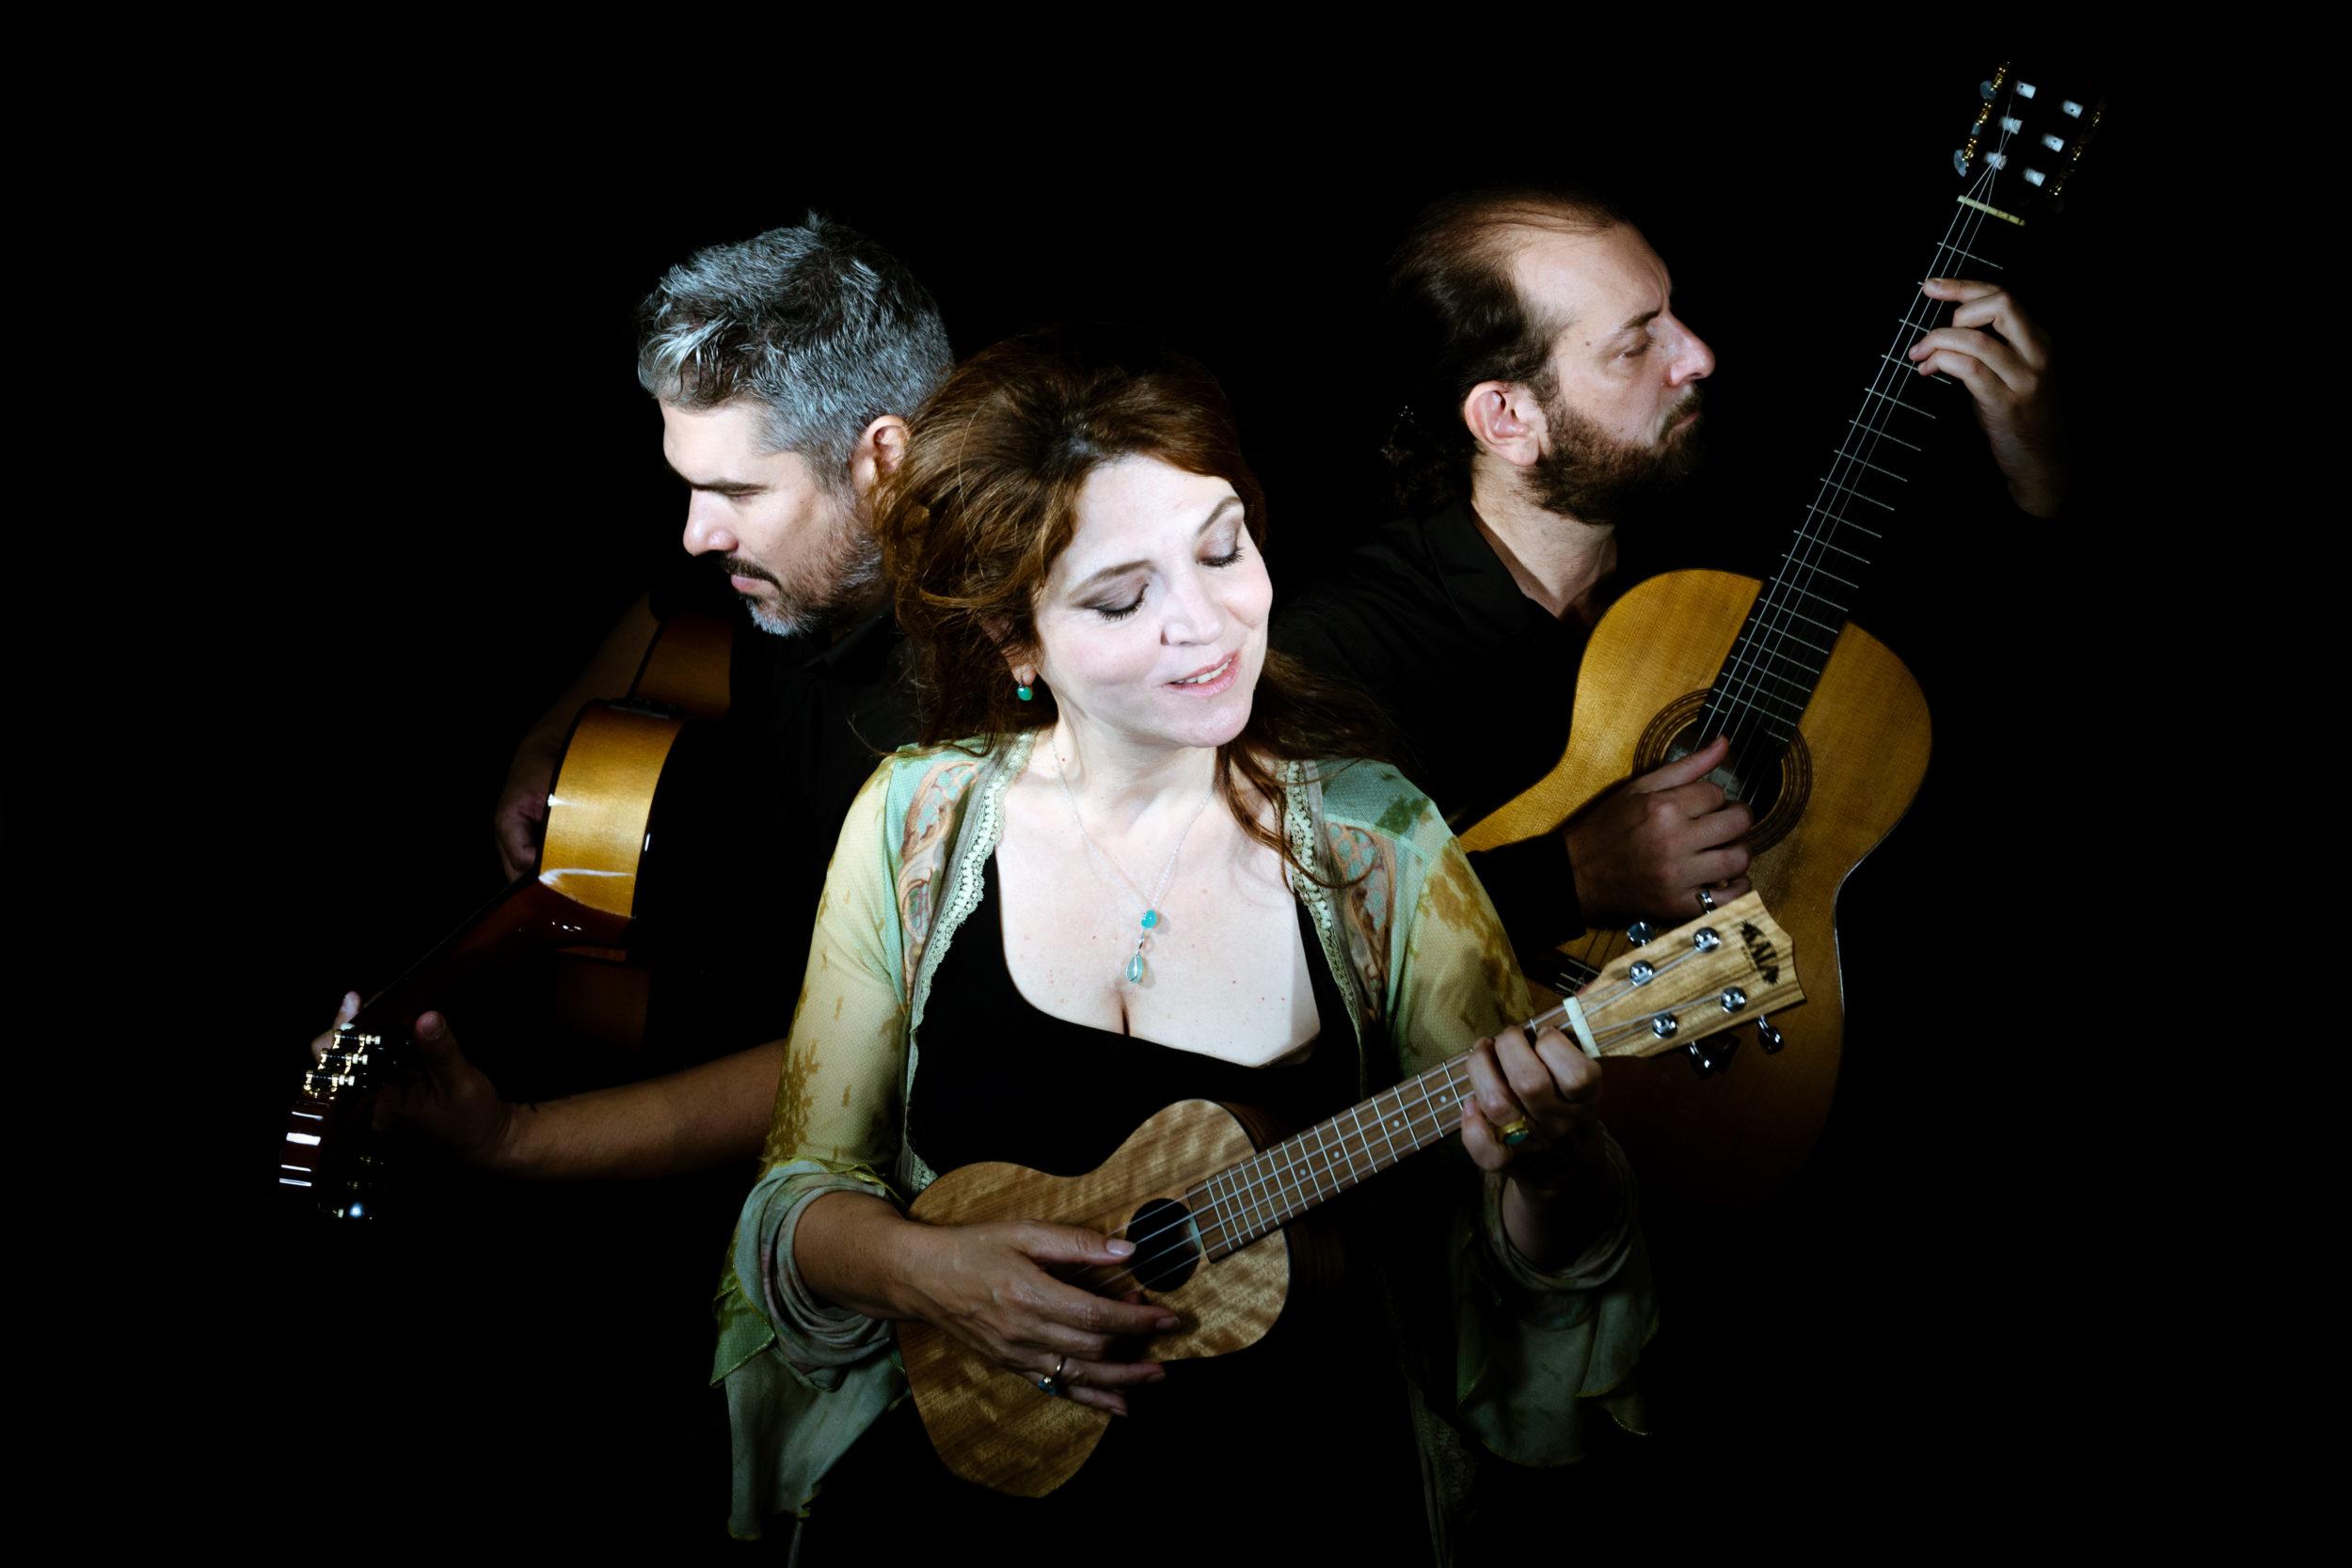 Agnes Jaoui ©️ Philippe Garcia